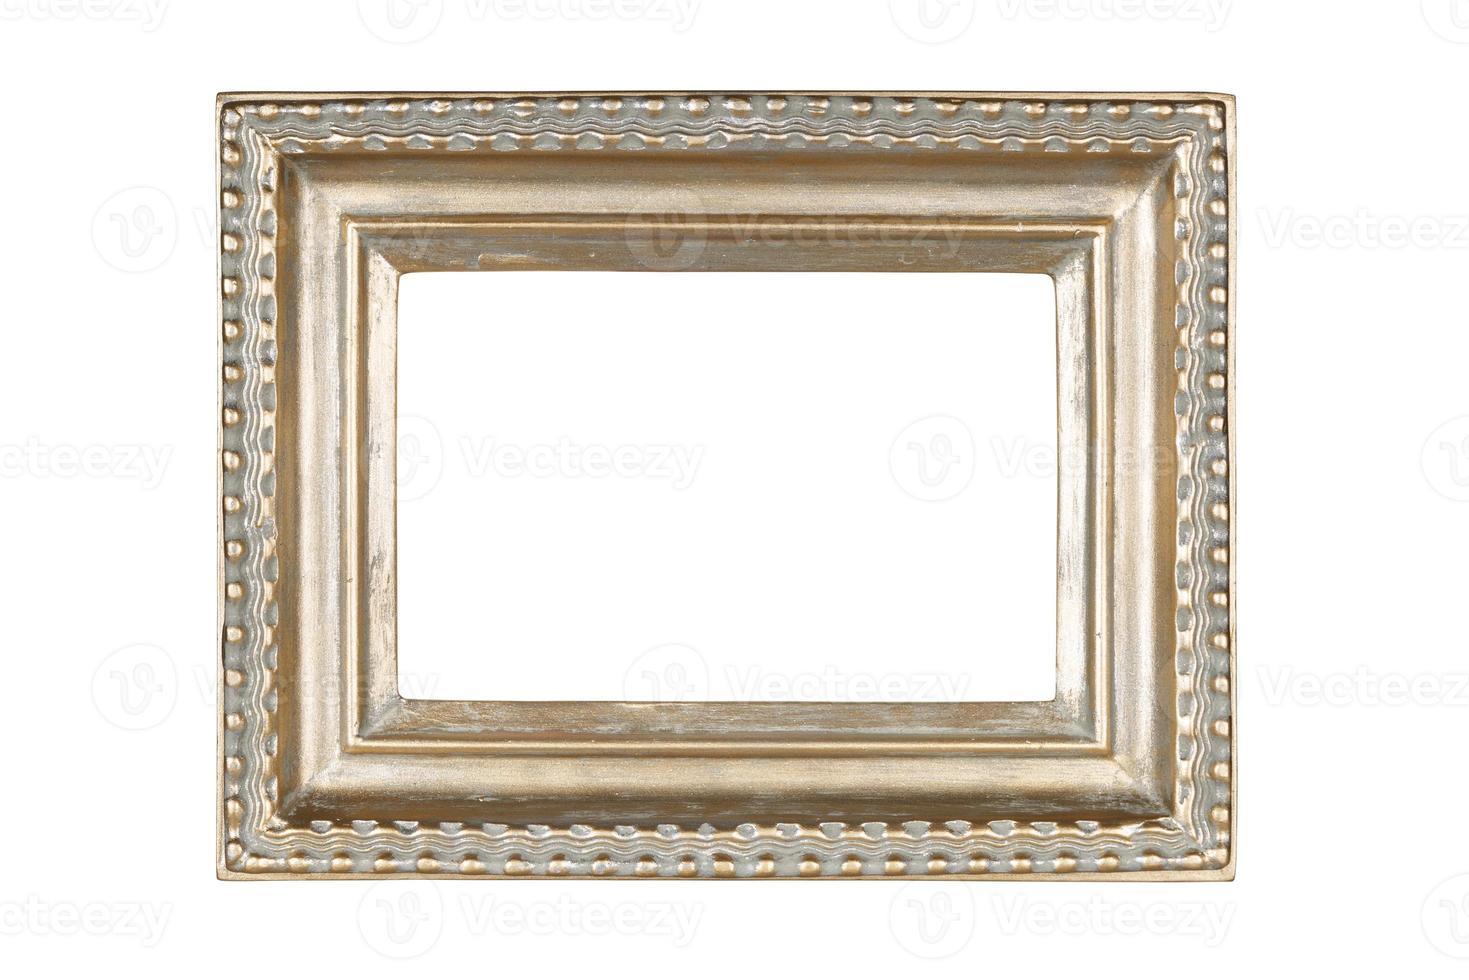 moldura prata-ouro foto